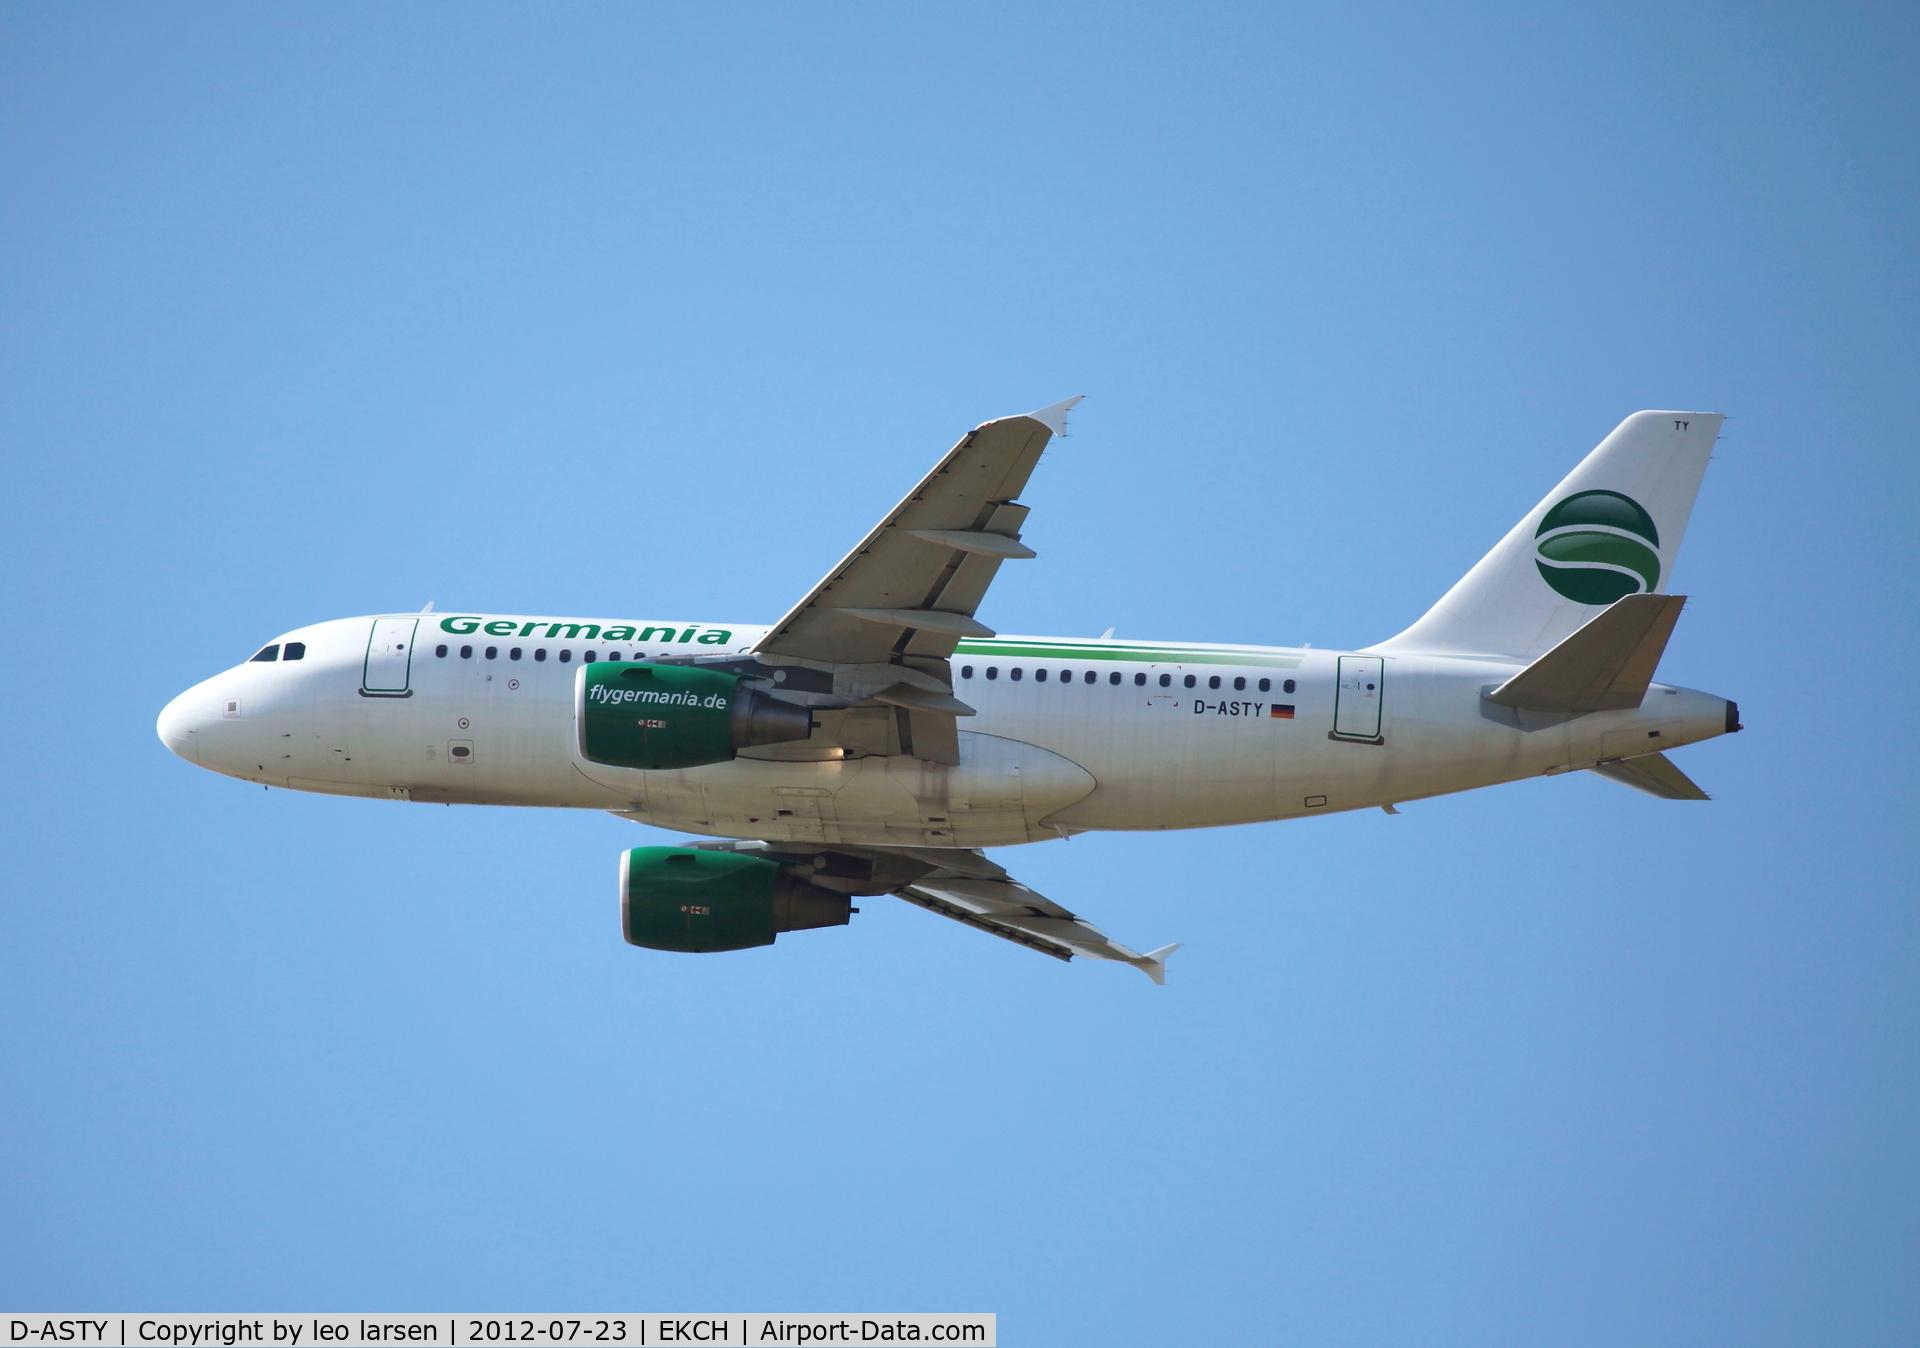 D-ASTY, 2008 Airbus A319-112 C/N 3407, Copenhagen 23.7.2012